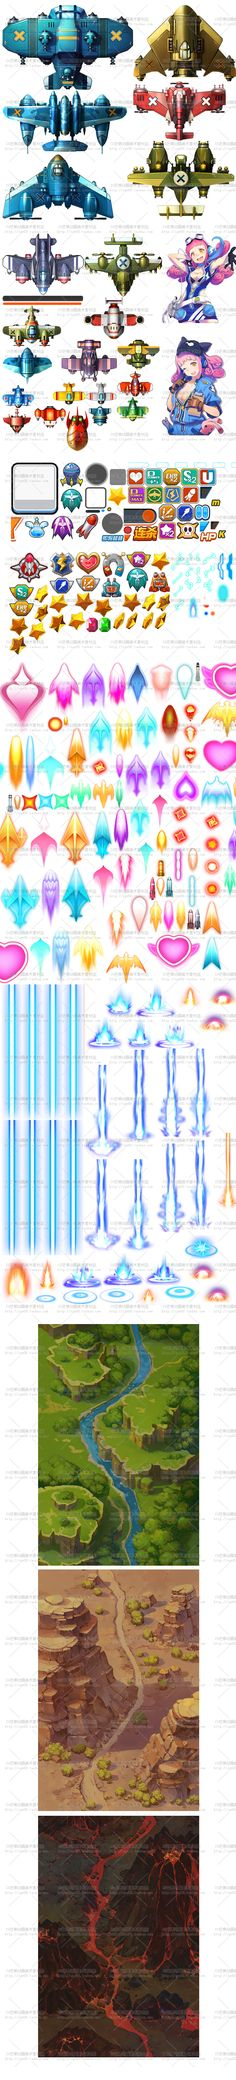 http://item.taobao.com/item.htm?spm=a1z10.5.w4002-5428120391.39.H4NDdN